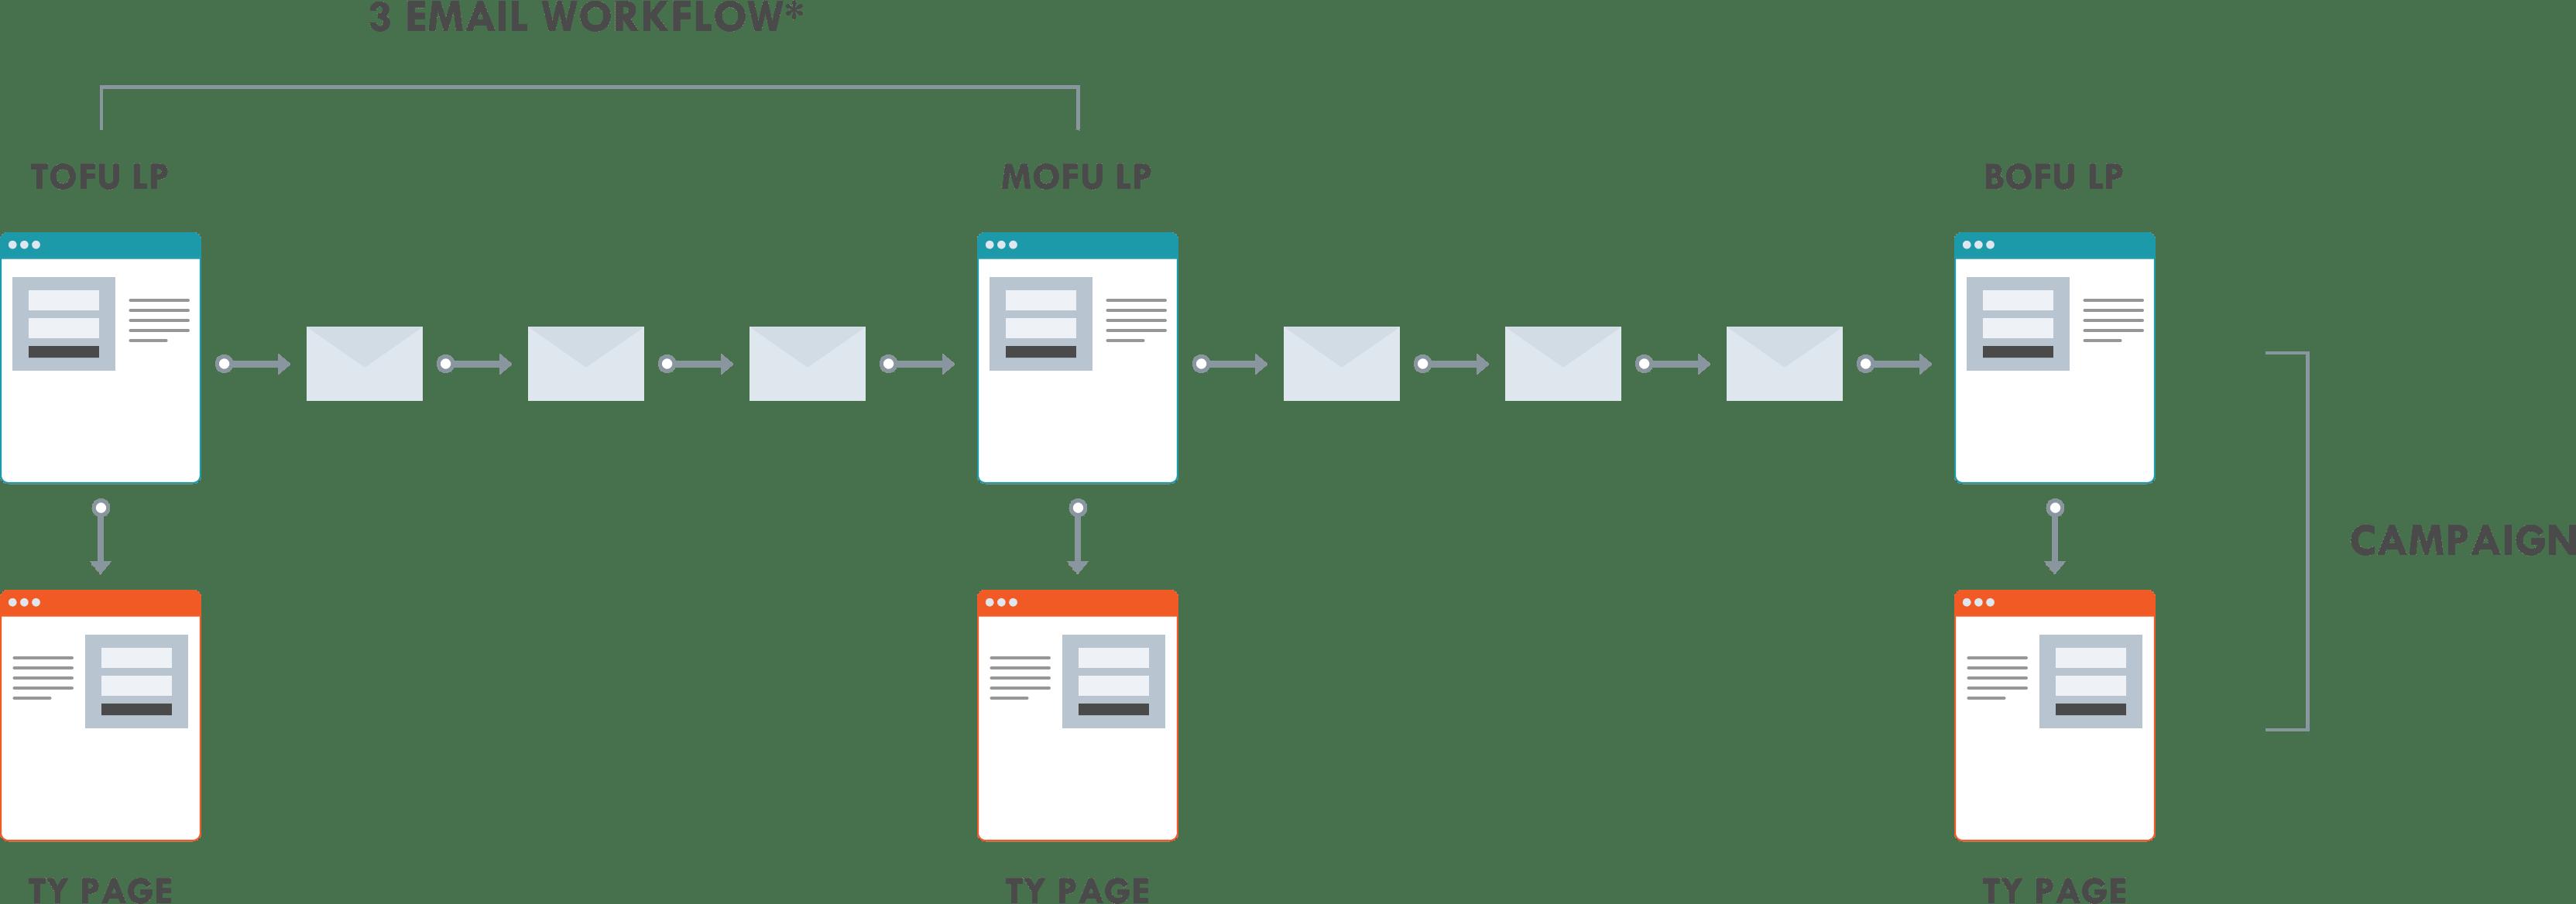 three-email-workflow